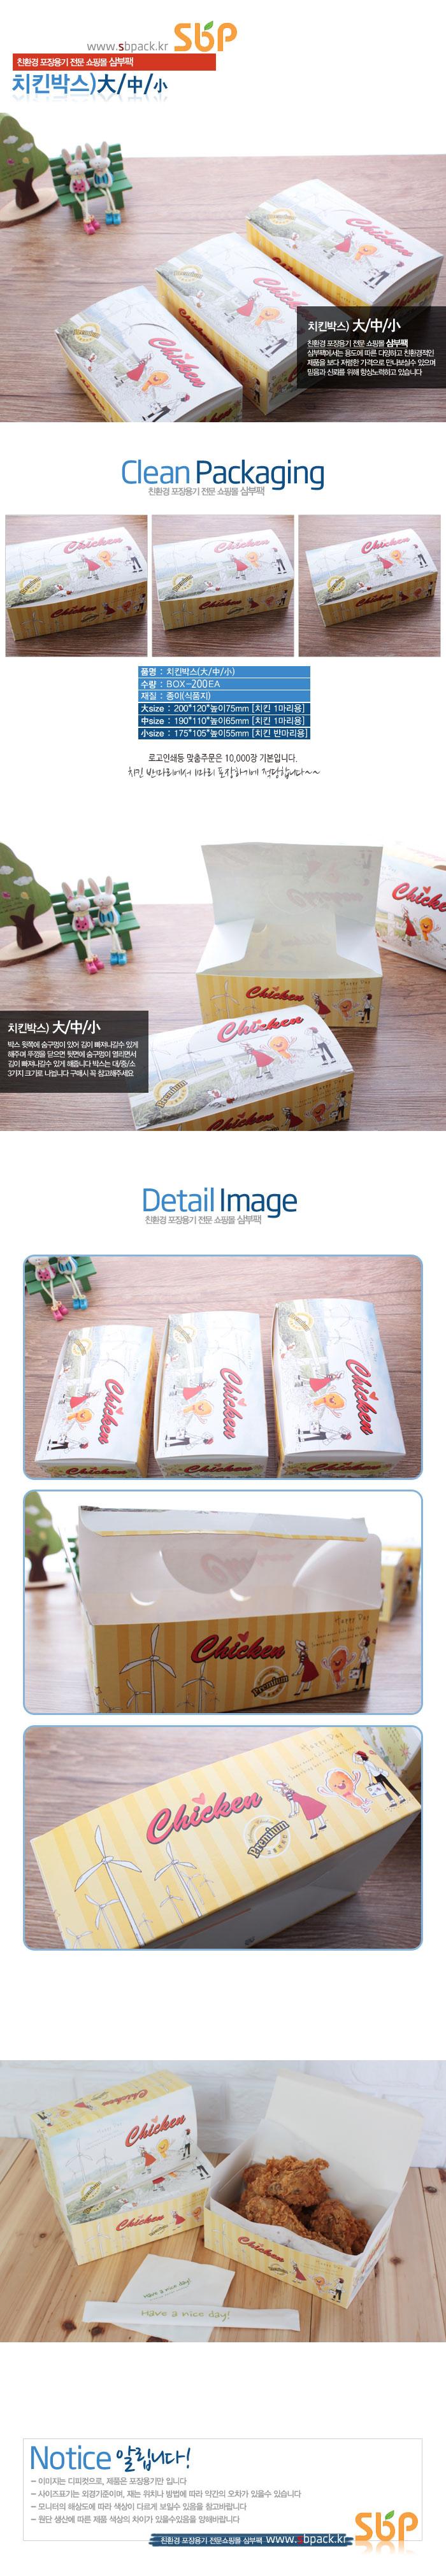 box_c_s_165755.jpg